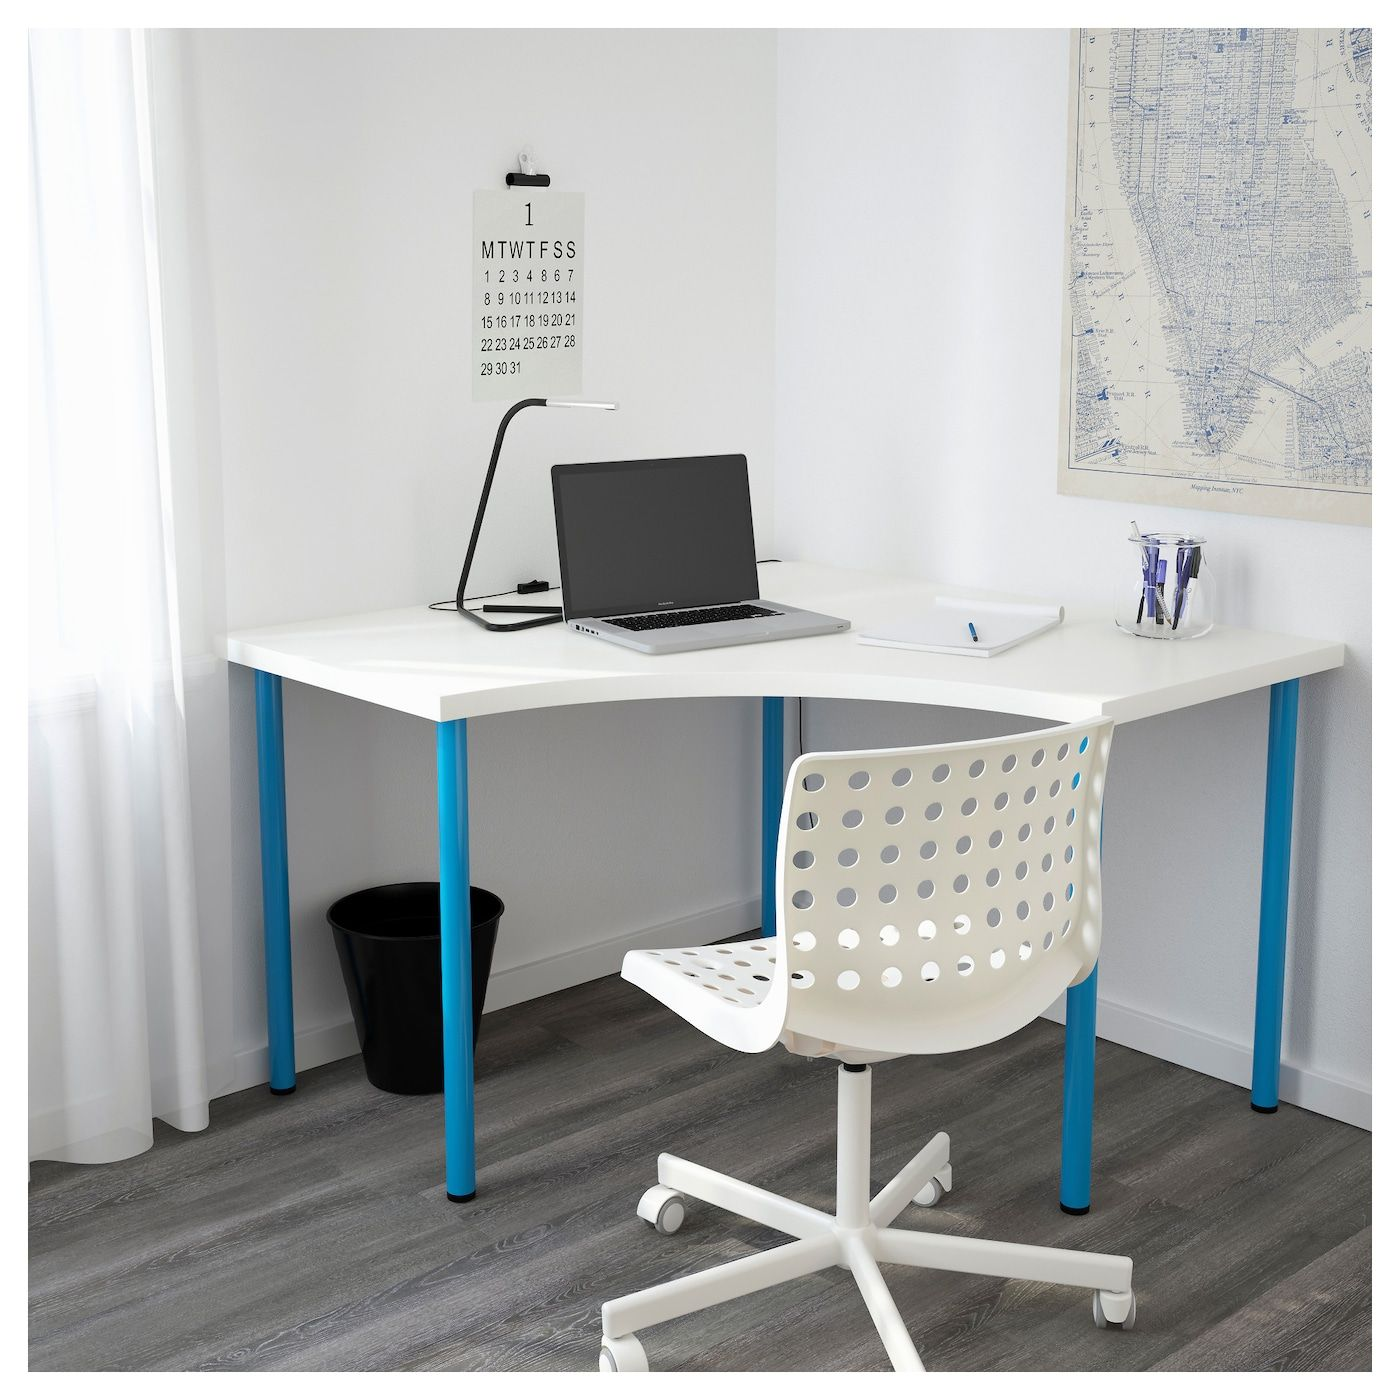 Ikea Us Furniture And Home Furnishings Corner Table Ikea Corner Desk